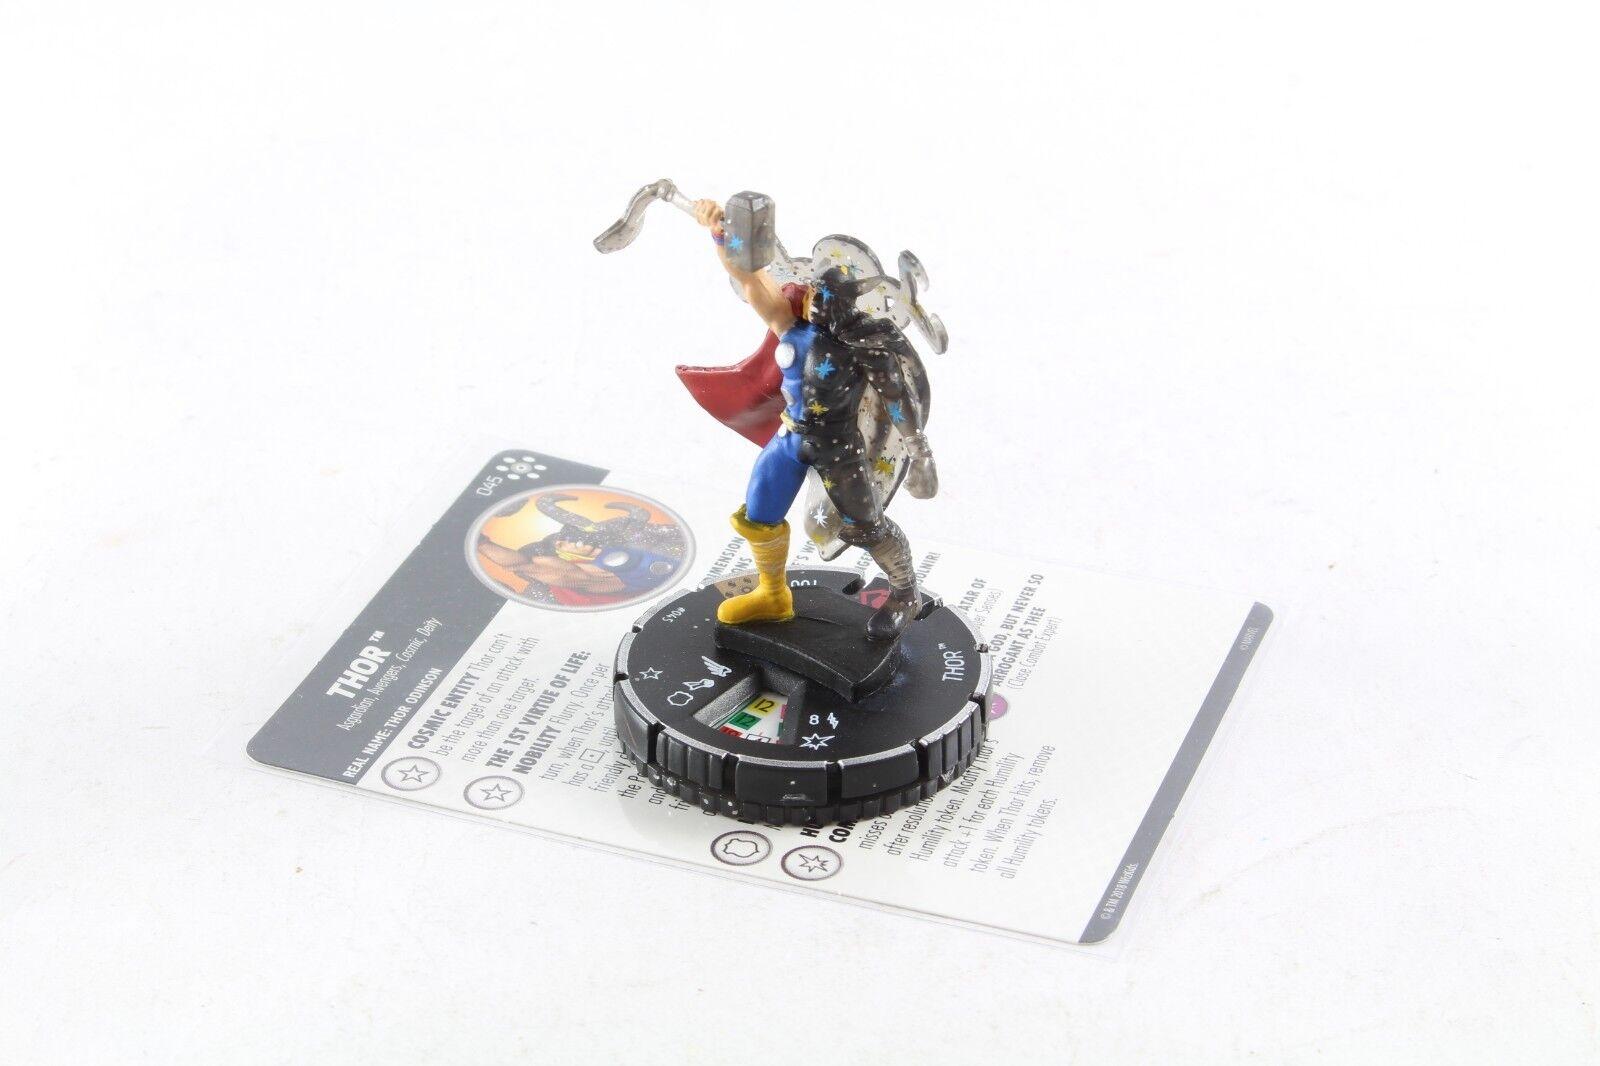 Heroclix Marvel Infinity Guerra Thor 045 Super Raro Sr Chase